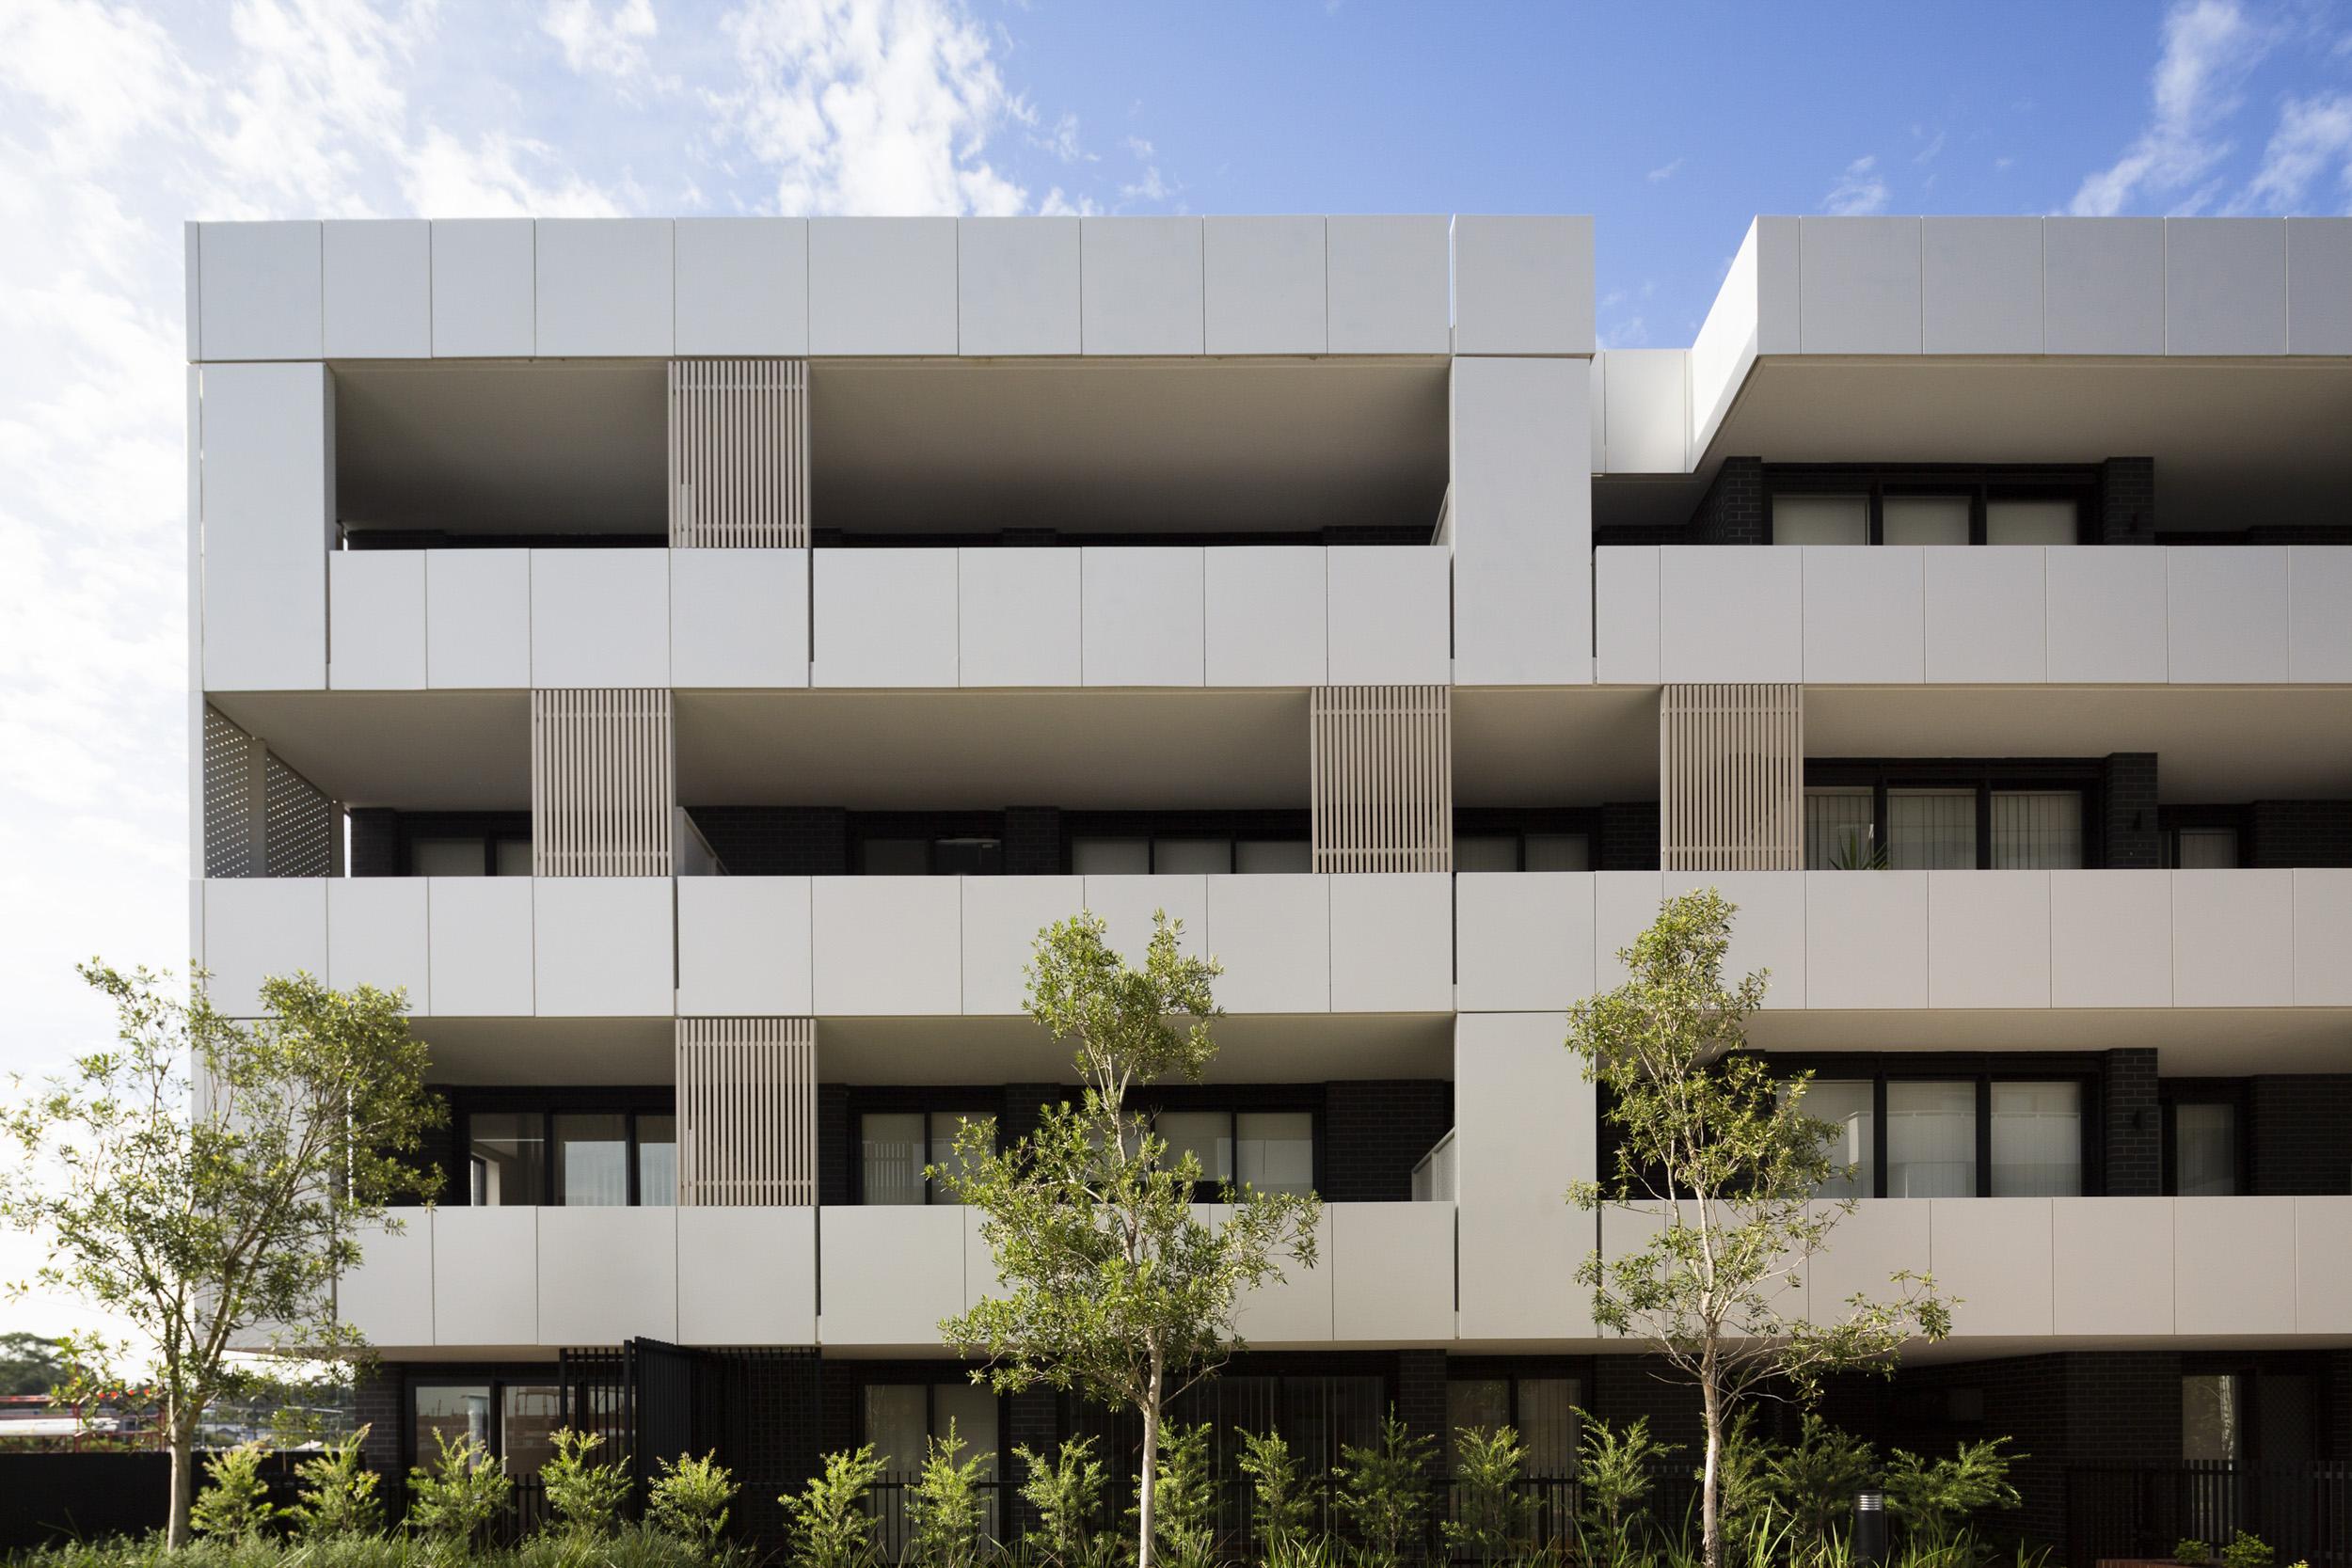 architecture_photography_sydney_australia_27.jpg